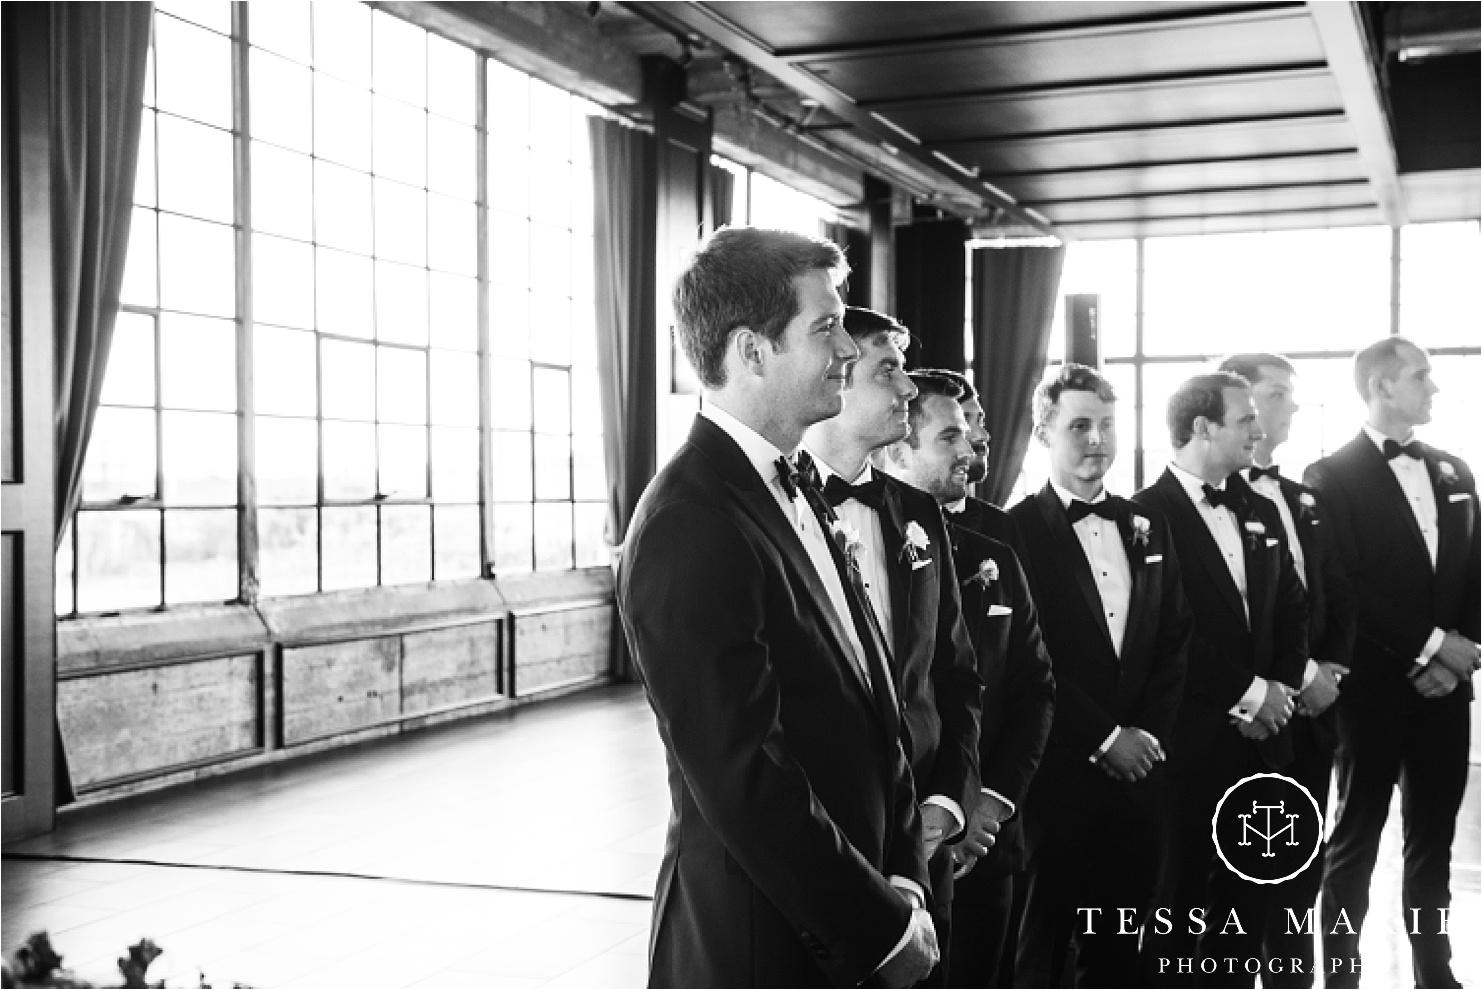 Tessa_marie_weddings_houston_wedding_photographer_The_astorian_0112.jpg